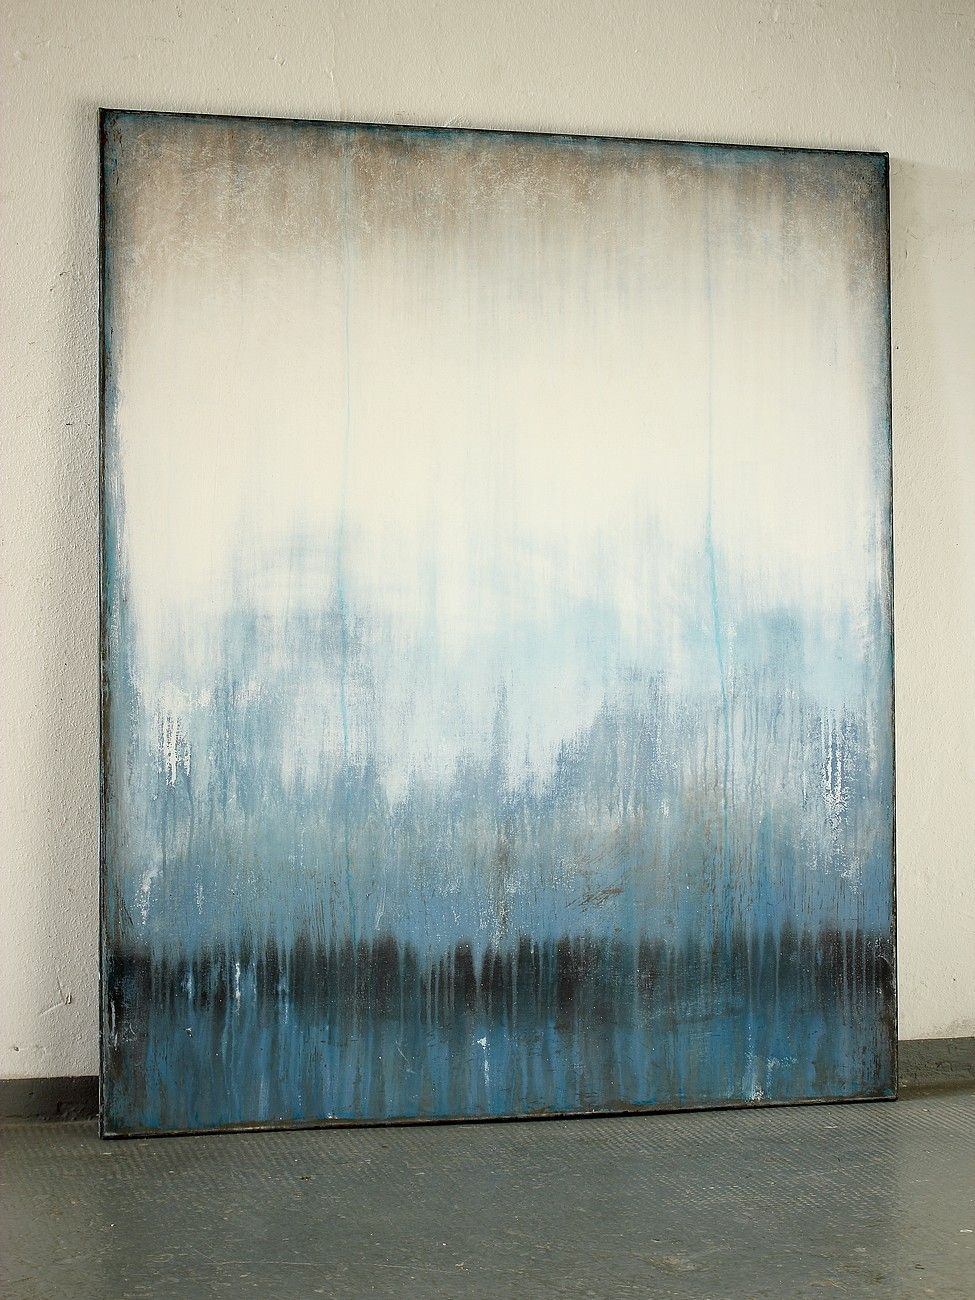 201 6 1 20 x 00 cm mischtechnik auf leinwand abstrakte kunst malerei painting abstract abstrakt galerie acryl bilder